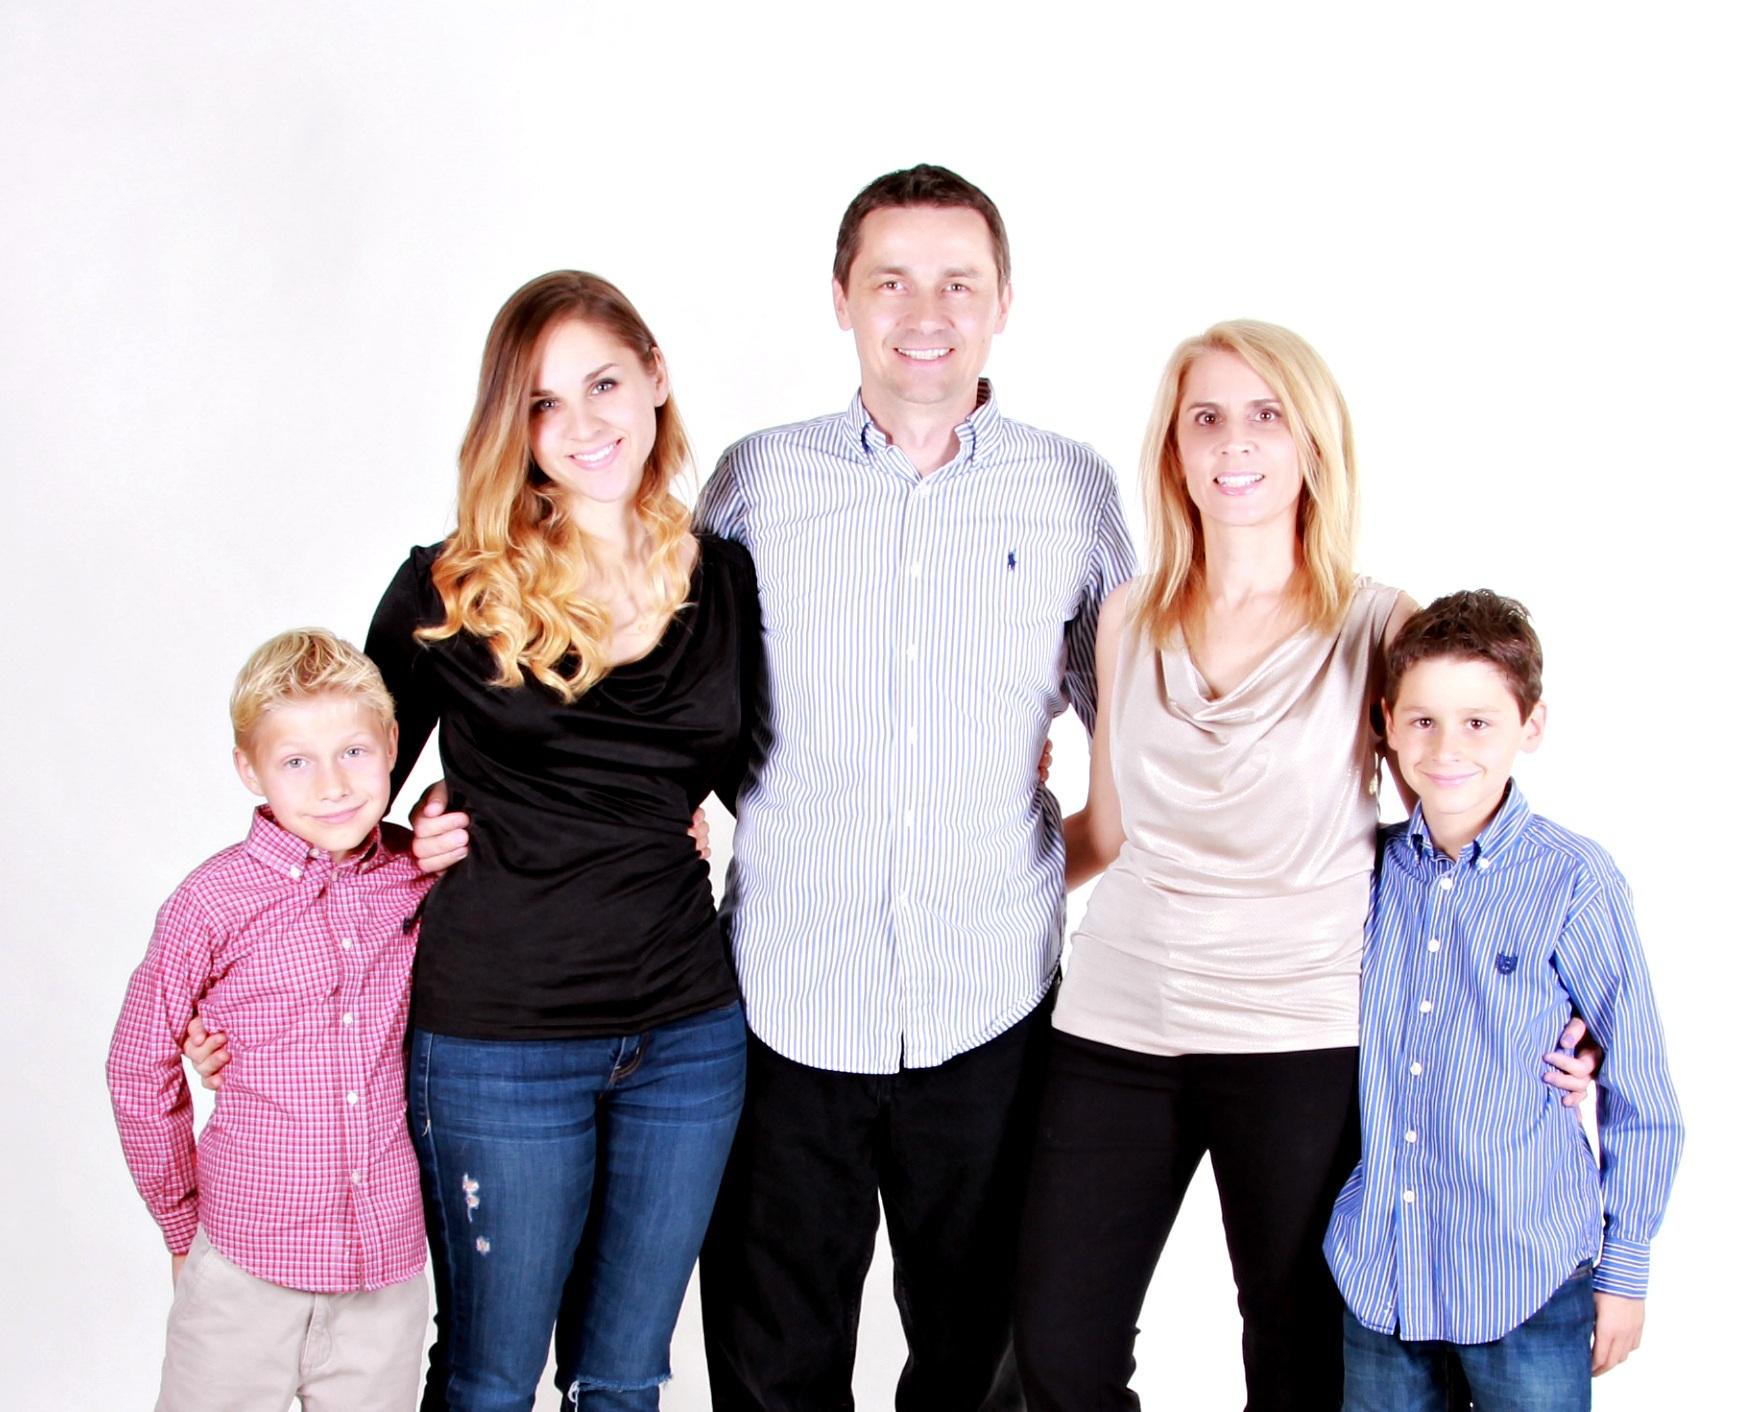 Ordinea in care te-ai nascut in familie se pare ca nu influenteaza doar personalitatea, ci si starea de sanatate. Cel putin asa sustin diverse studii prezentate de Rd.com.